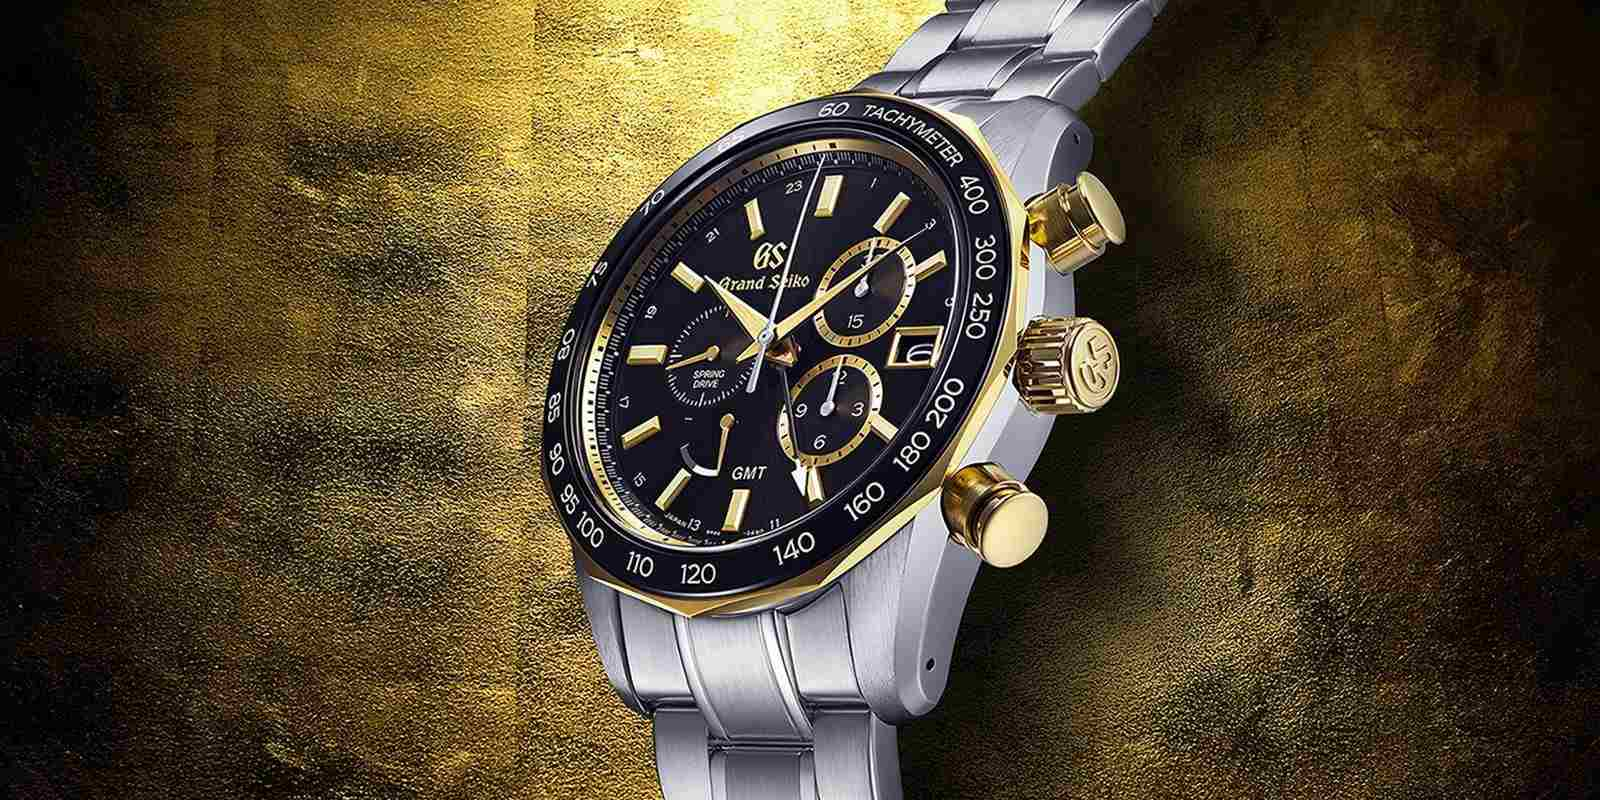 【2021線上錶展】黃金閃光!Grand Seiko全新Spring Drive GMT計時腕錶